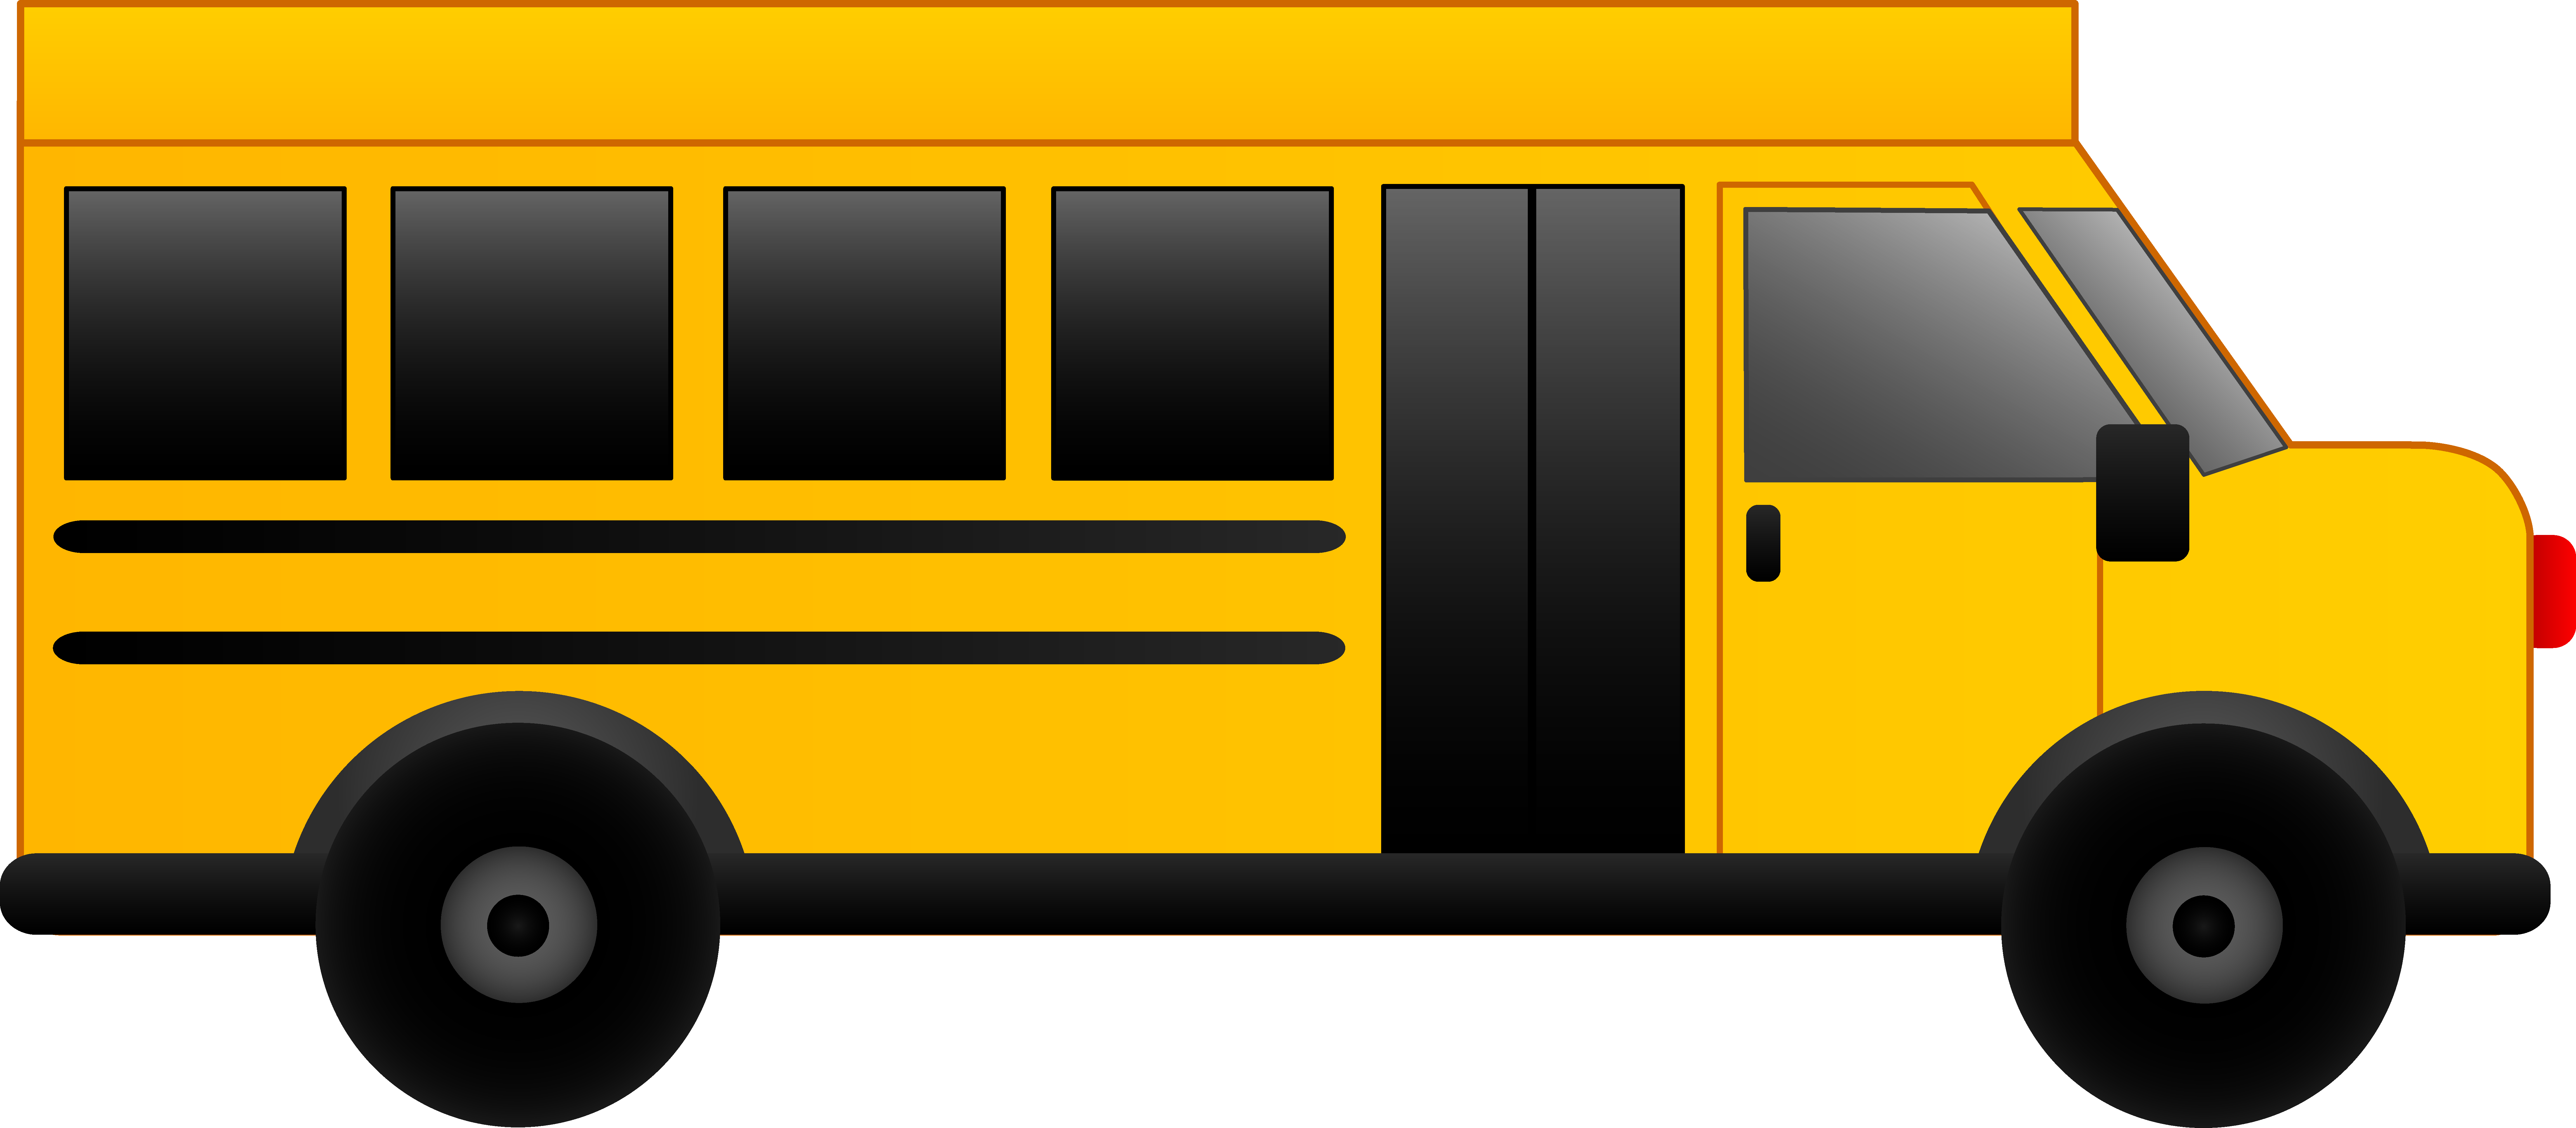 8820x3863 Free School Bus Clipart 7 4